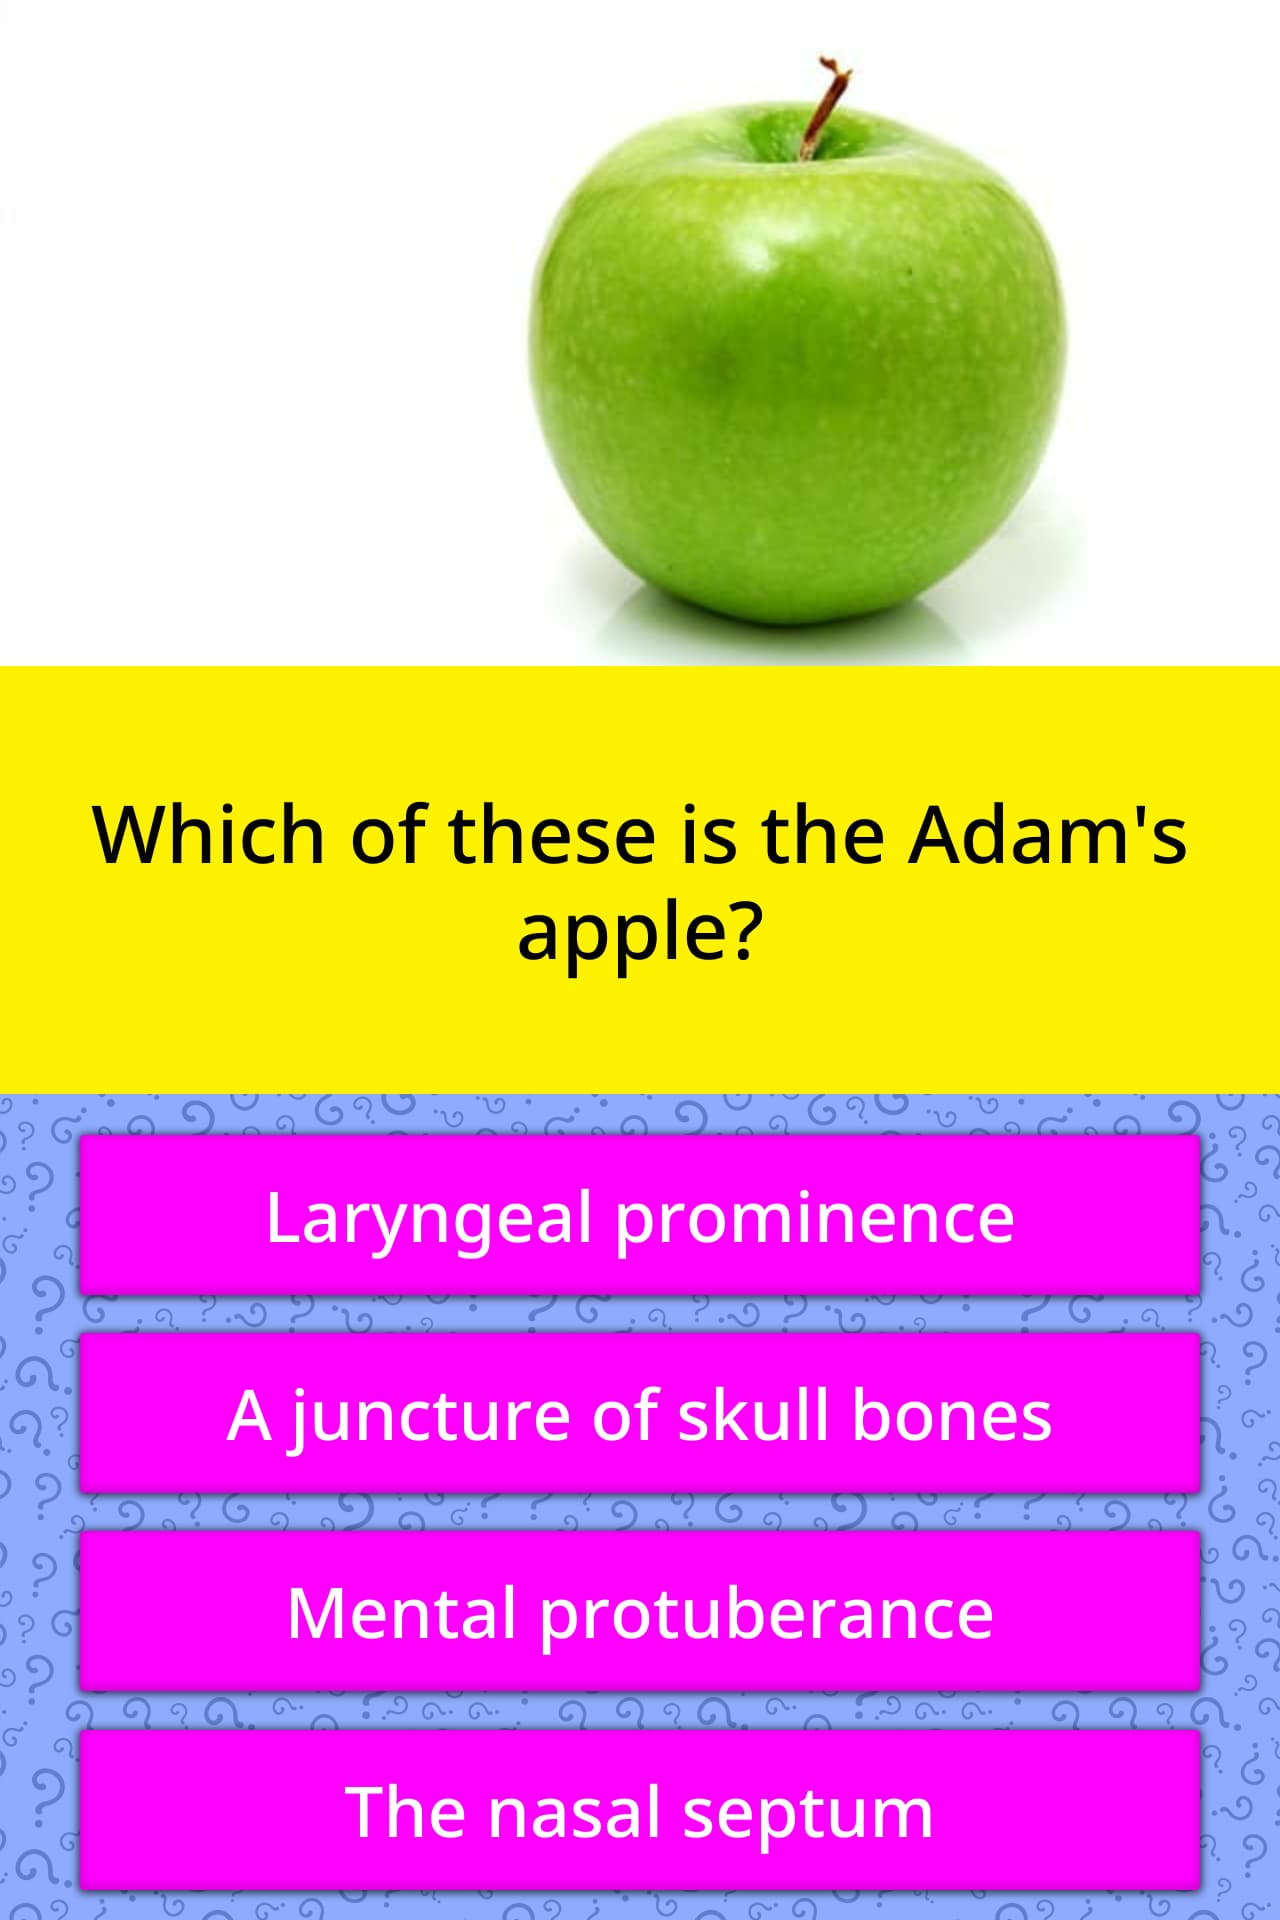 Adamovo Apple a prostatitisből